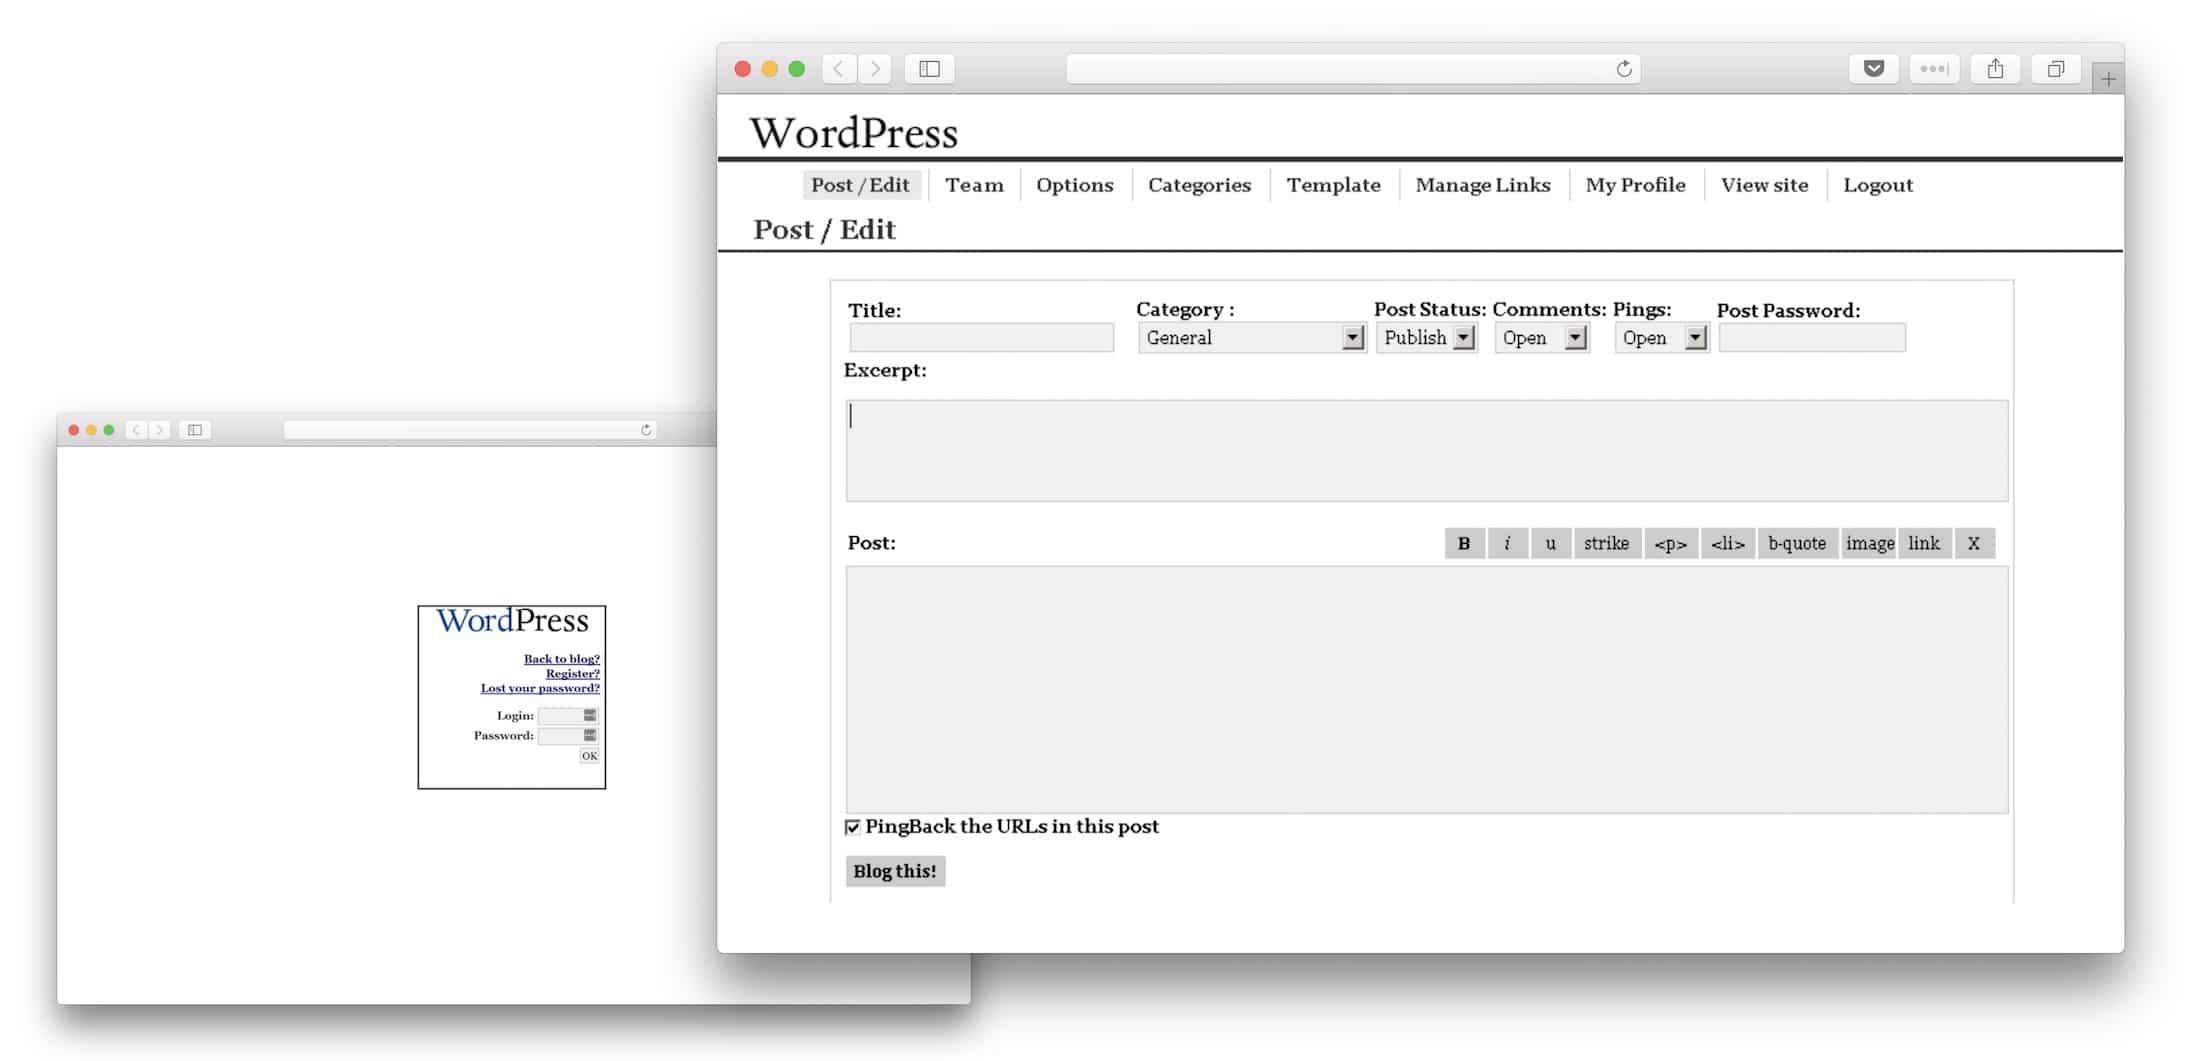 WordPress 0.7 UI